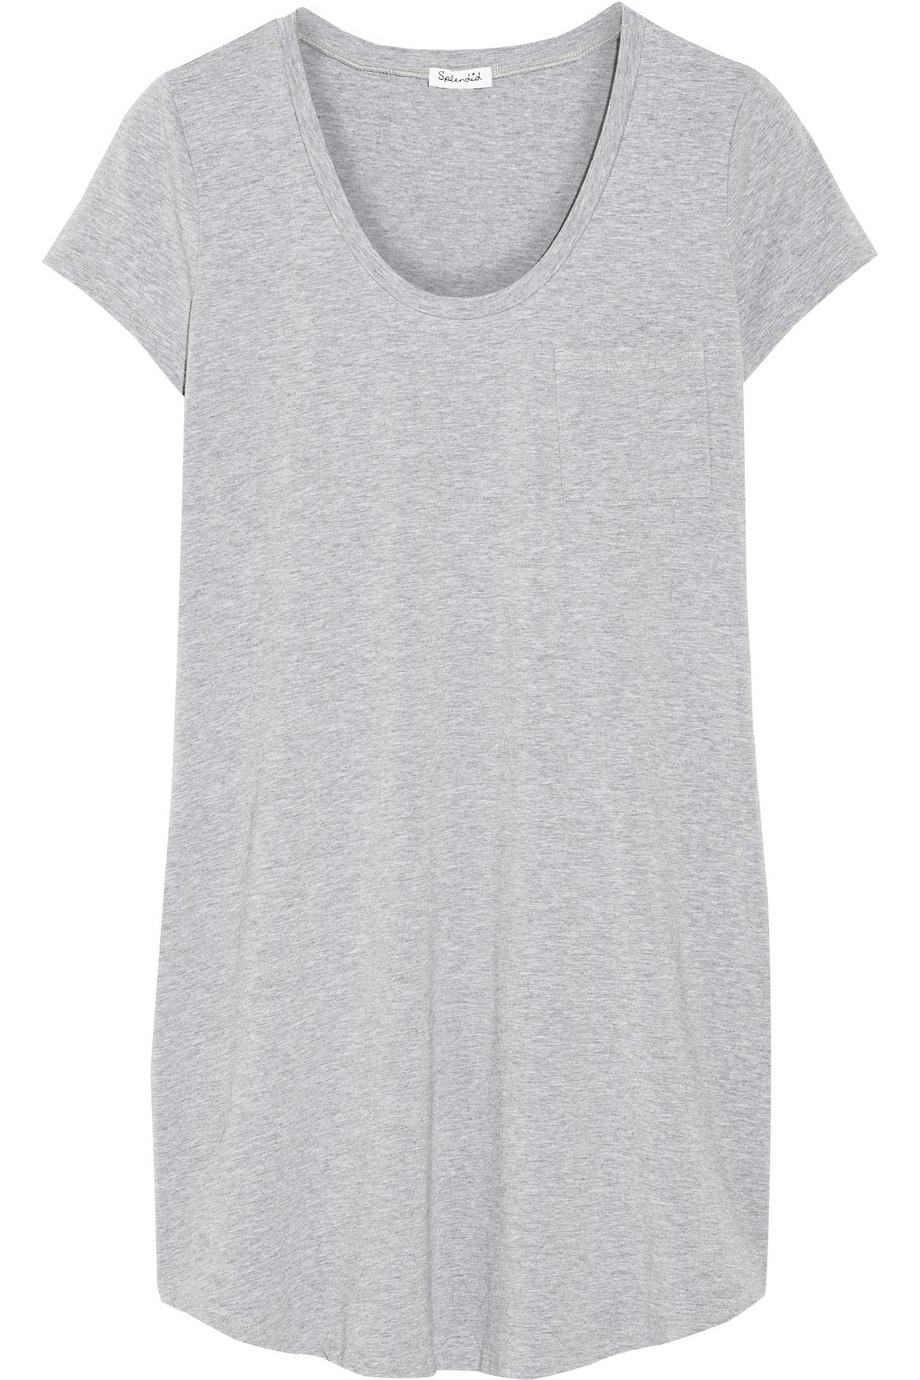 Splendid Stretch Supima Cotton And Modal Blend T Shirt